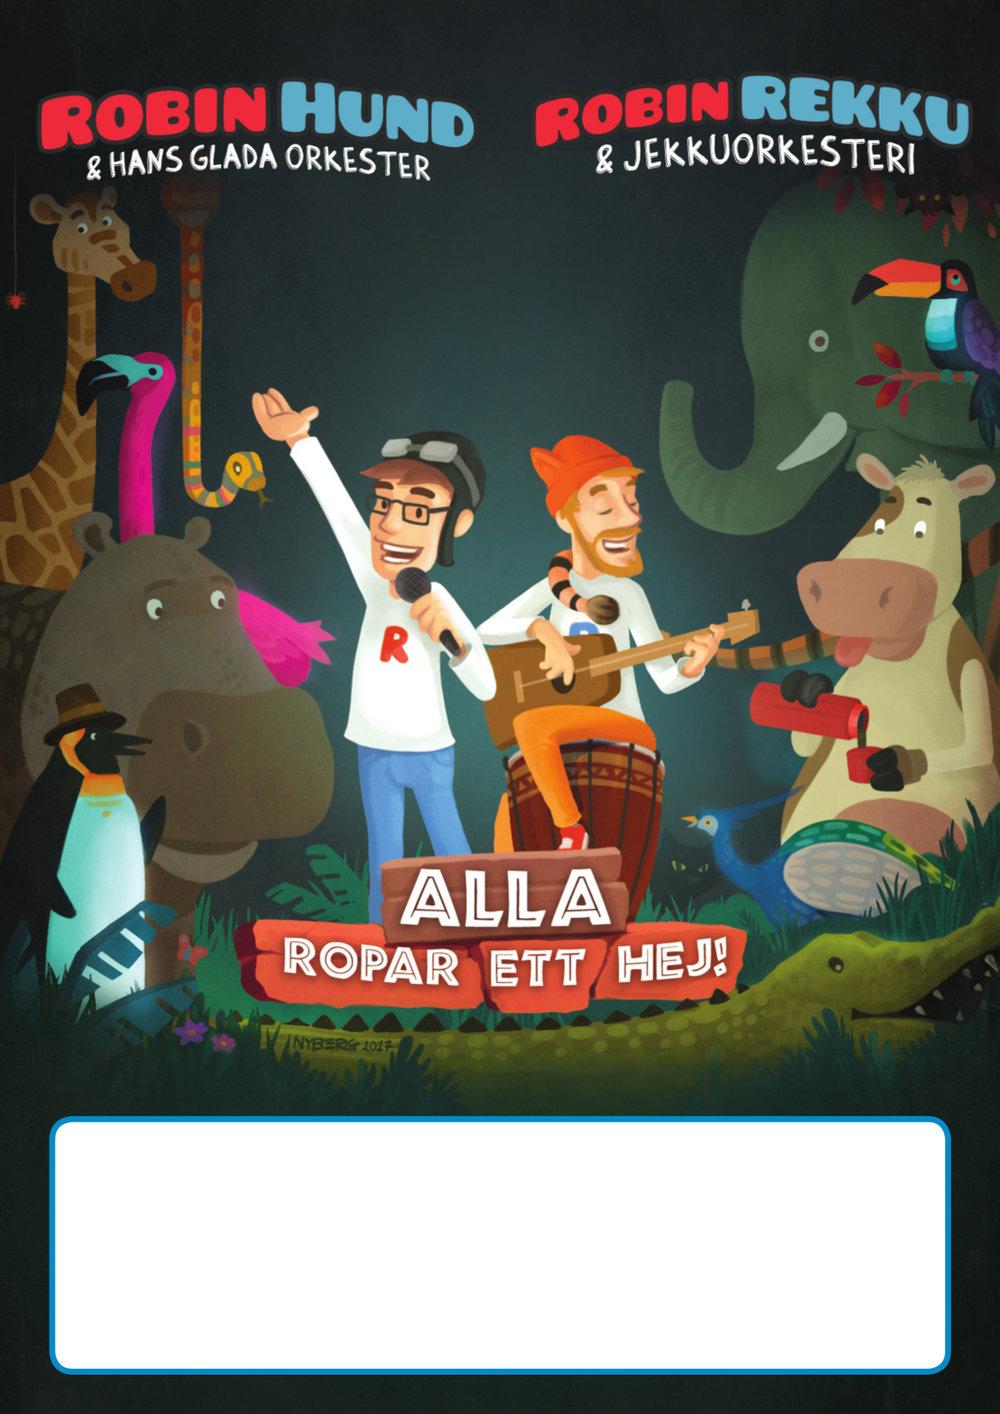 Robin Rekku & Jekkuorkesteri kaksikielinen juliste Robin Hund & Hans glada orkester tvåspråkig affisch